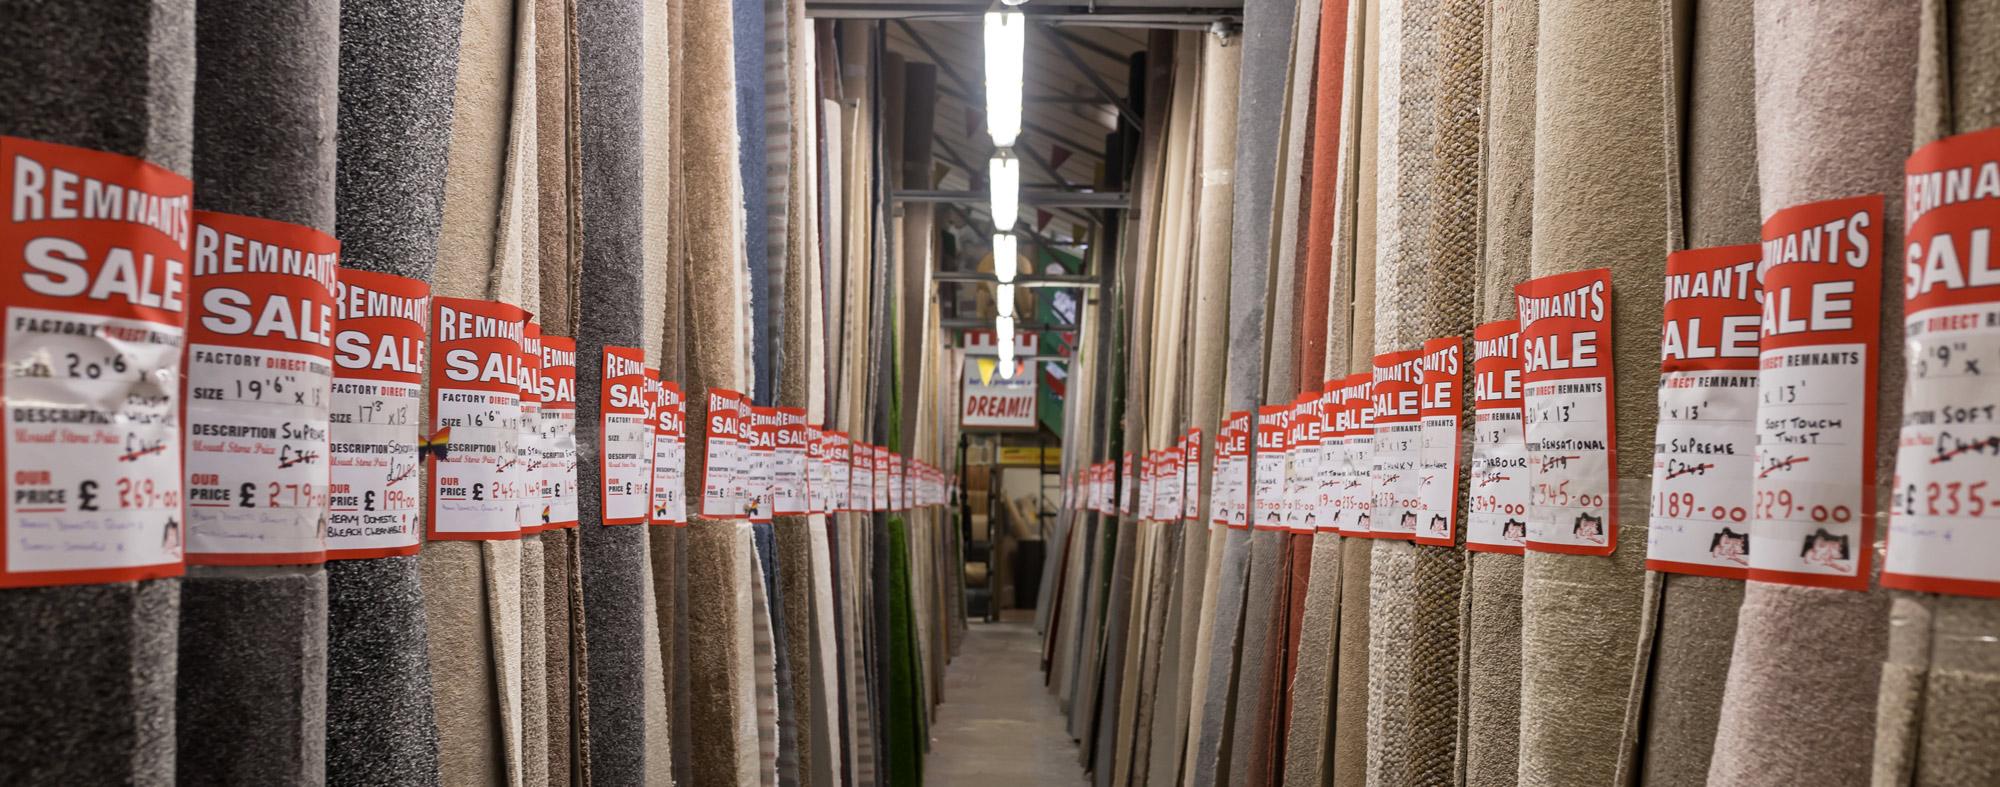 Carpet Castle Carpets At Half High Street Prices